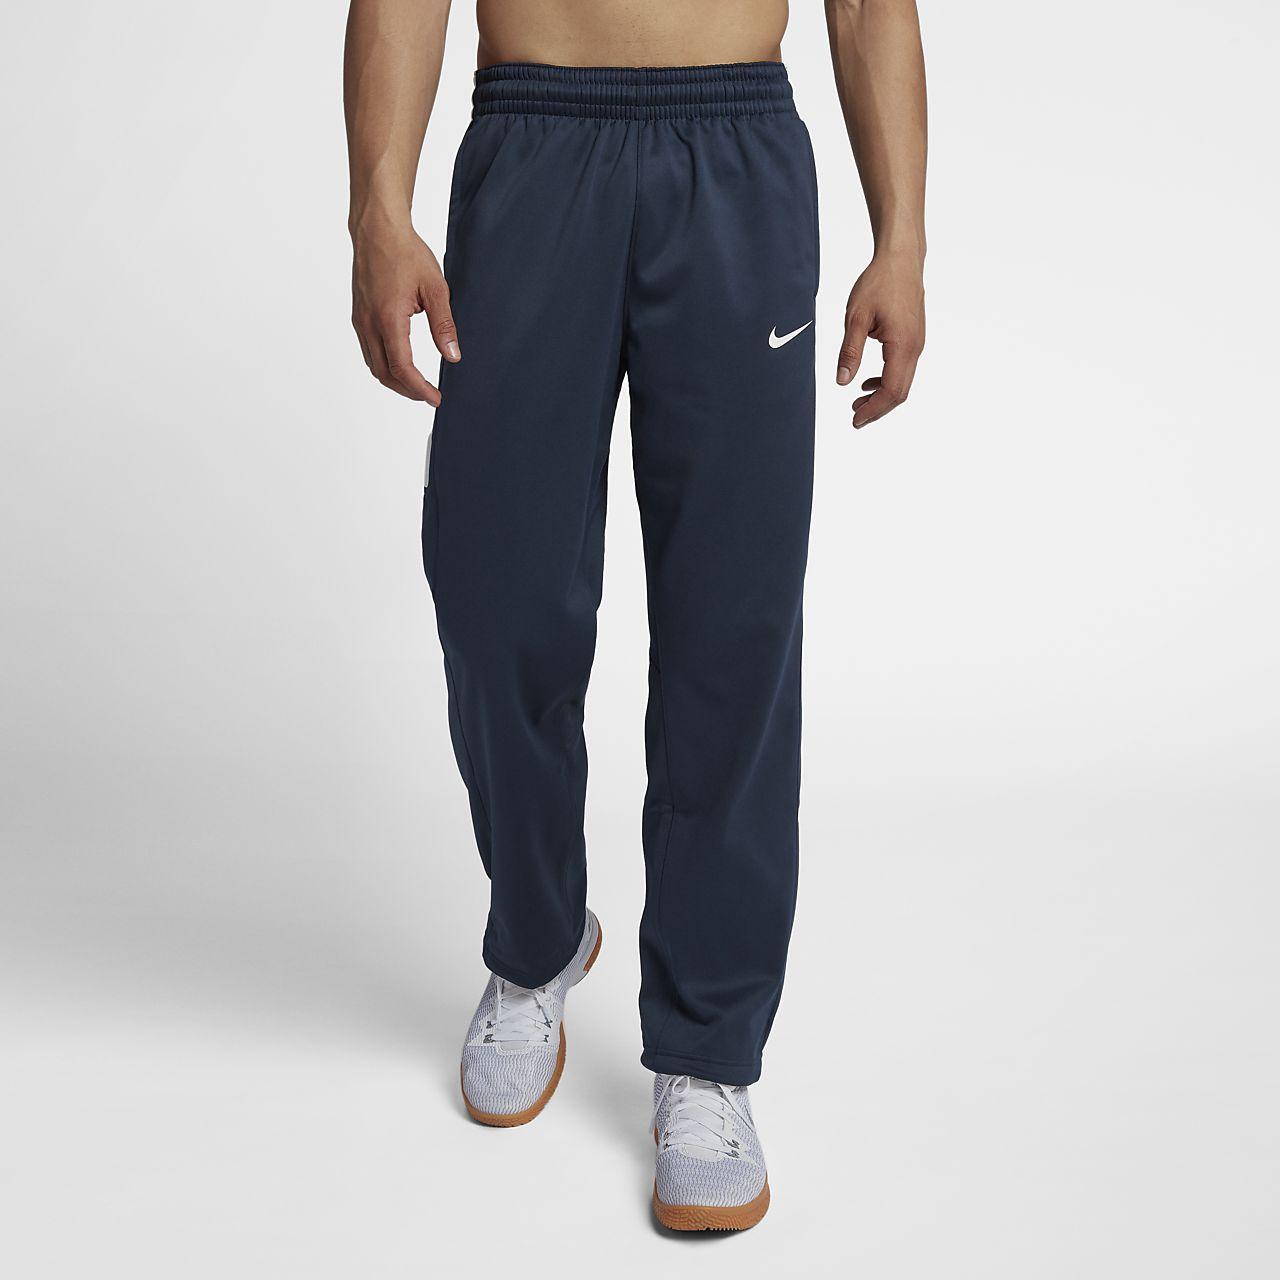 Nike Therma Elite Men's Basketball Pants